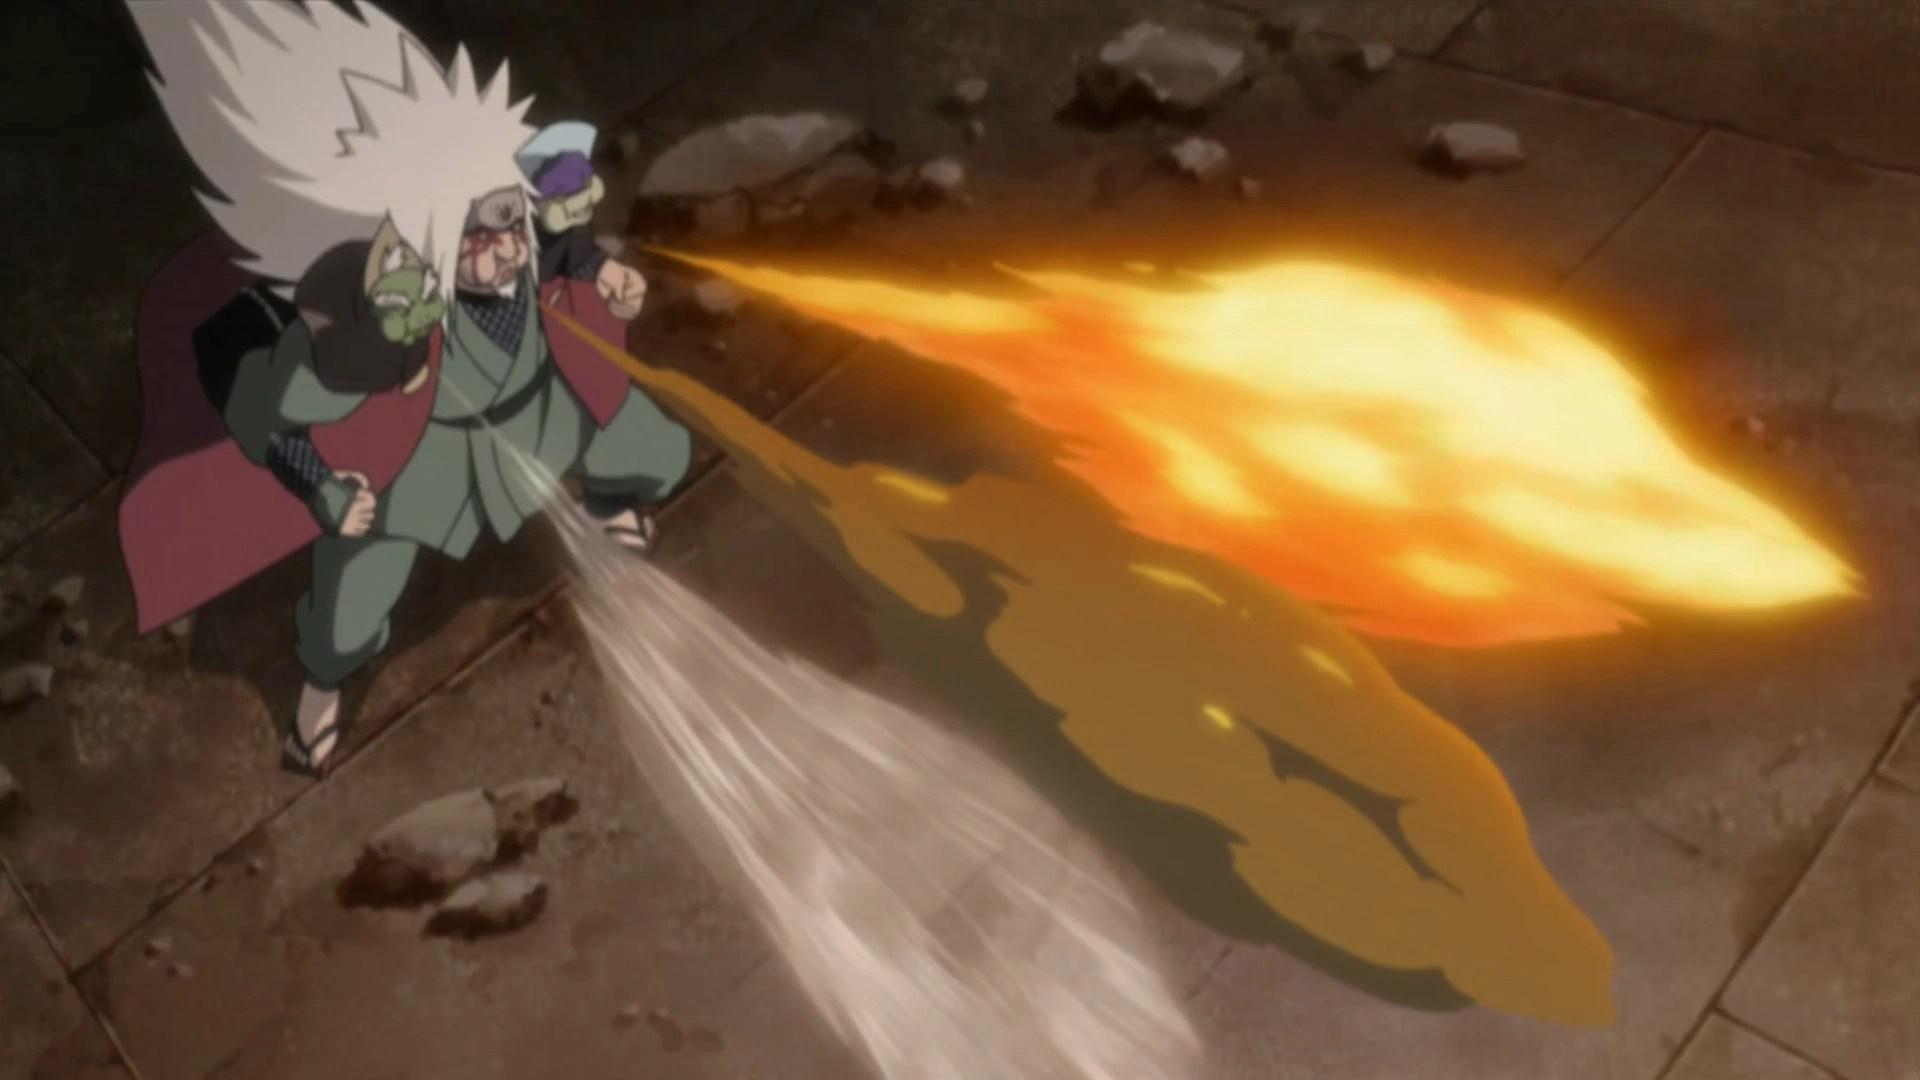 Naruto Vs Pain Wallpaper Hd Sage Art Goemon Narutopedia Fandom Powered By Wikia